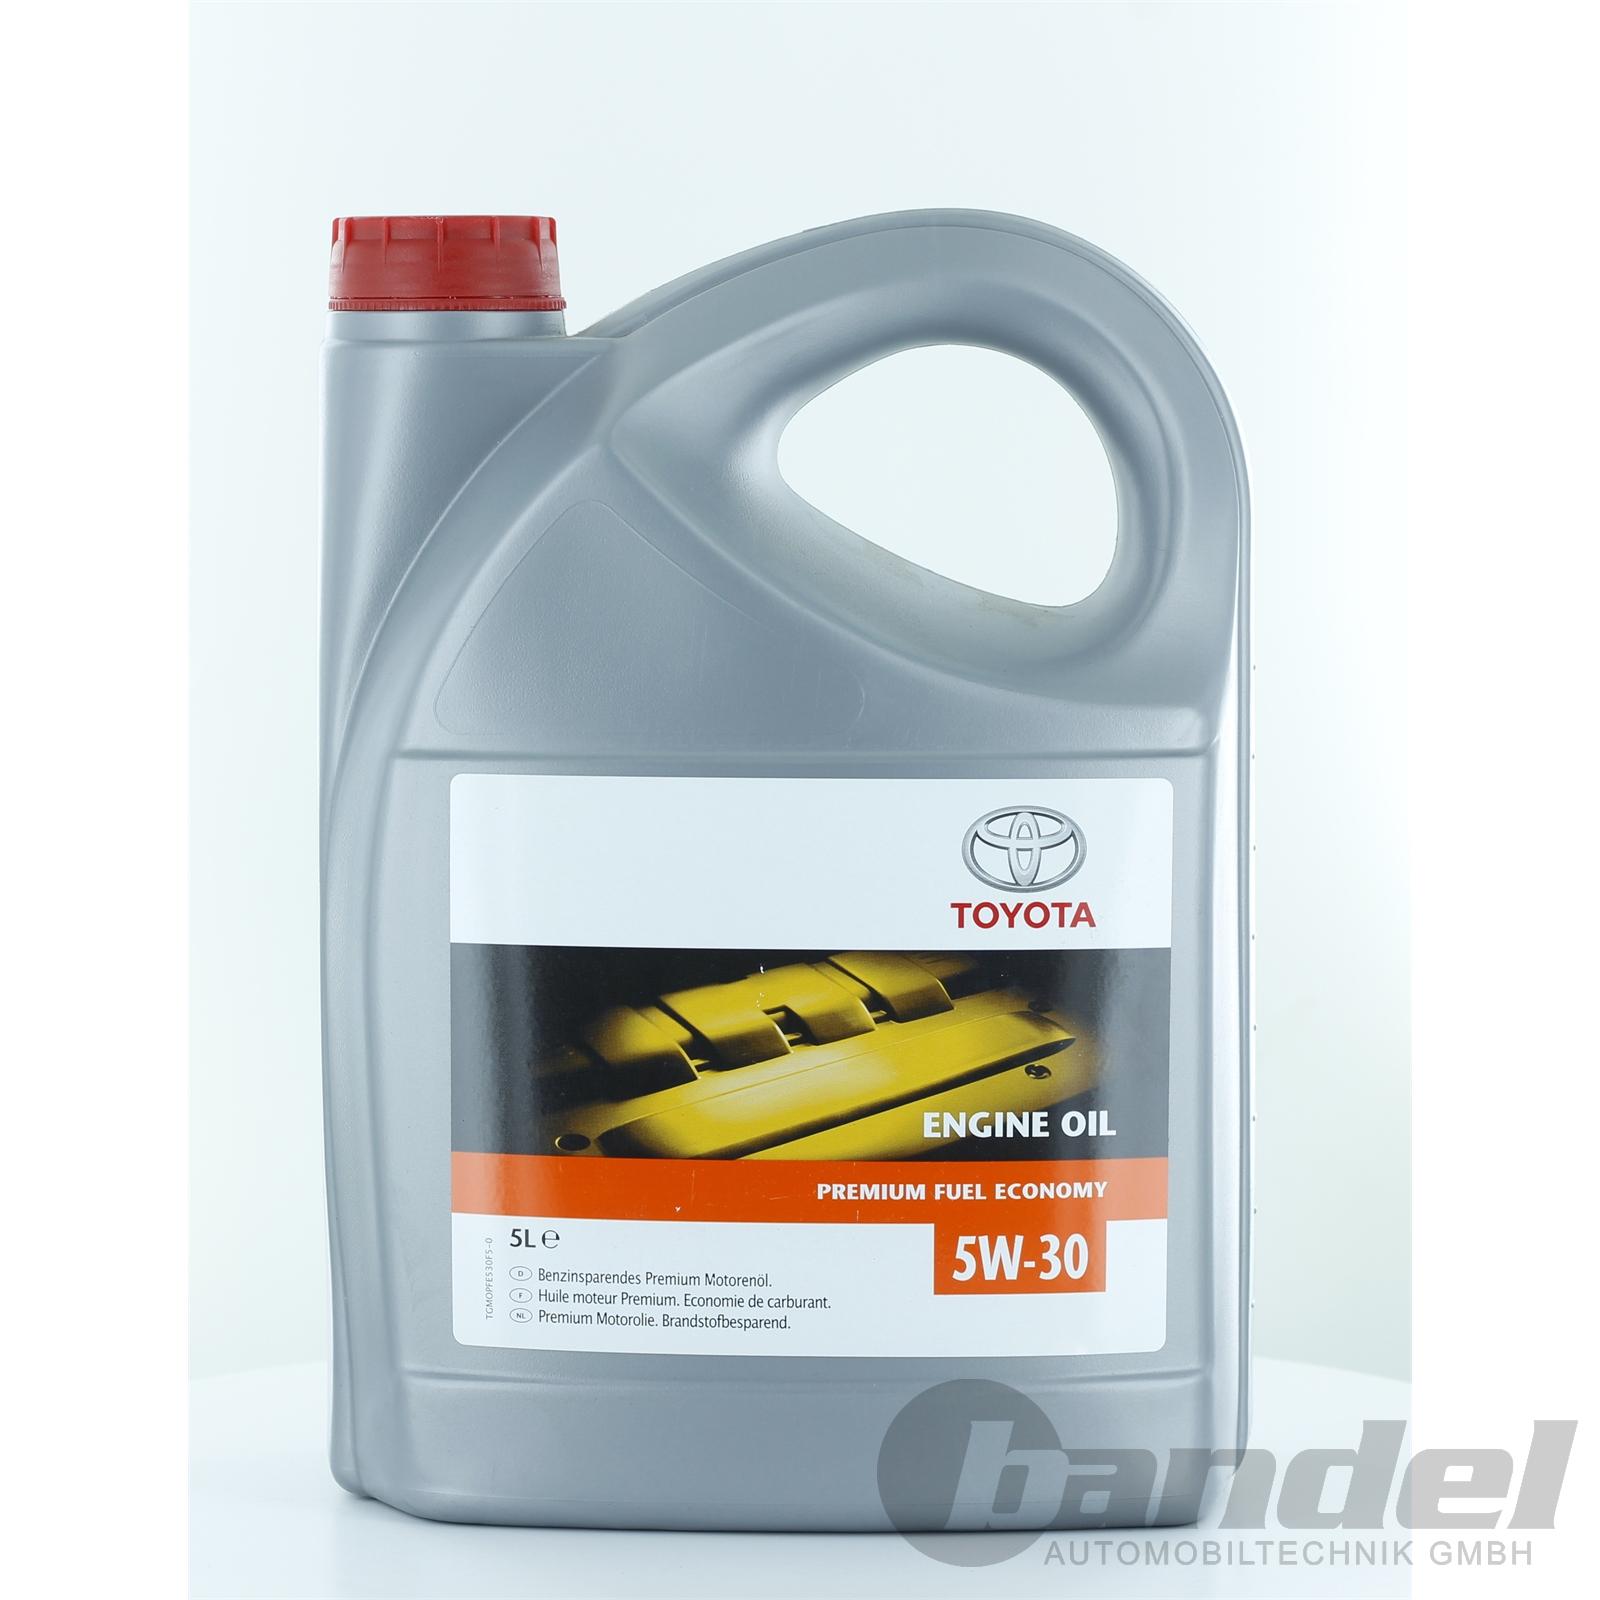 9 98 l 5 liter toyota motor l premium fuel economy 5w30. Black Bedroom Furniture Sets. Home Design Ideas